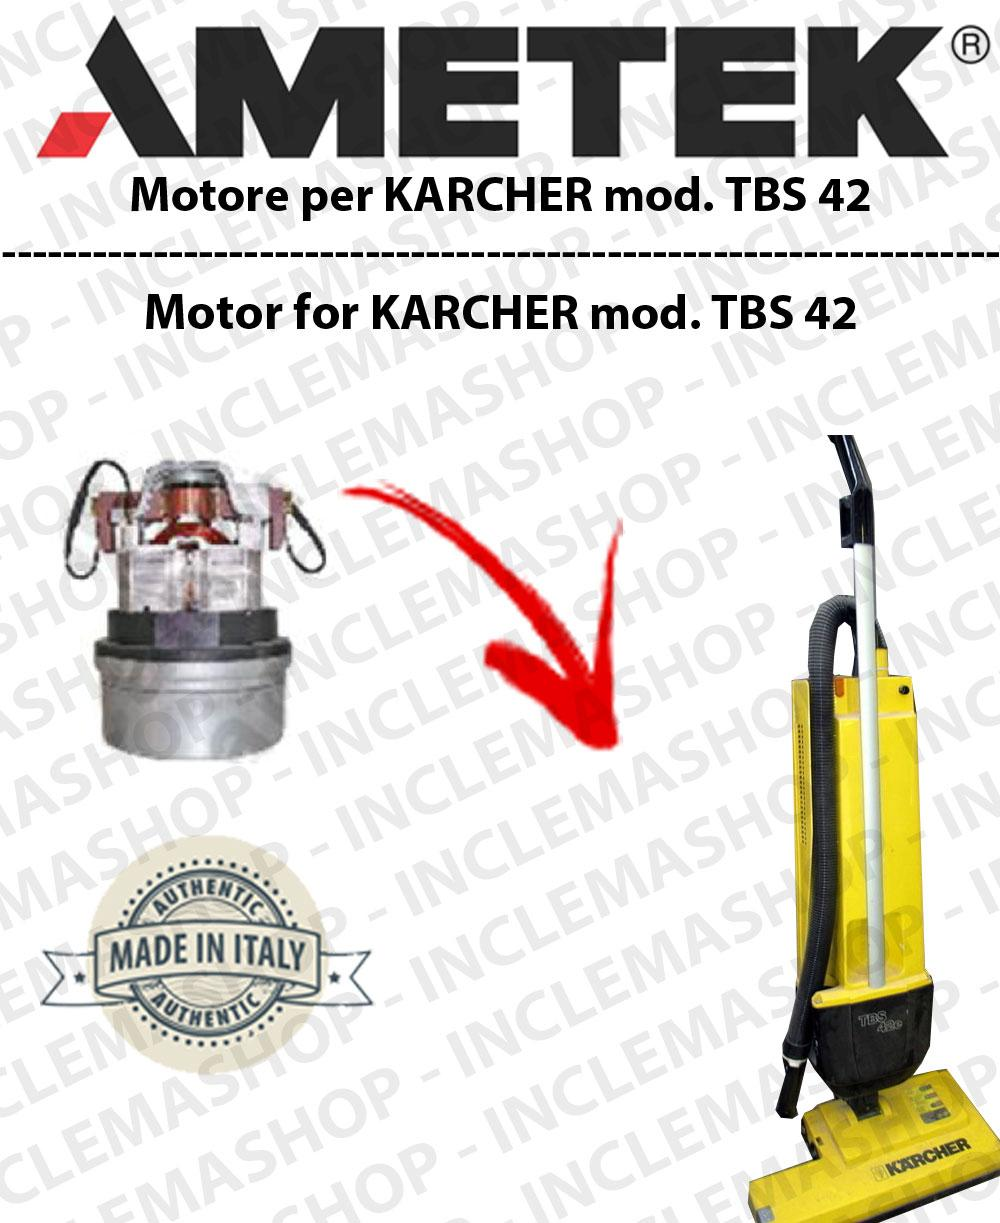 TBS 42 Saugmotor AMETEK für Klopfsauger KARCHER